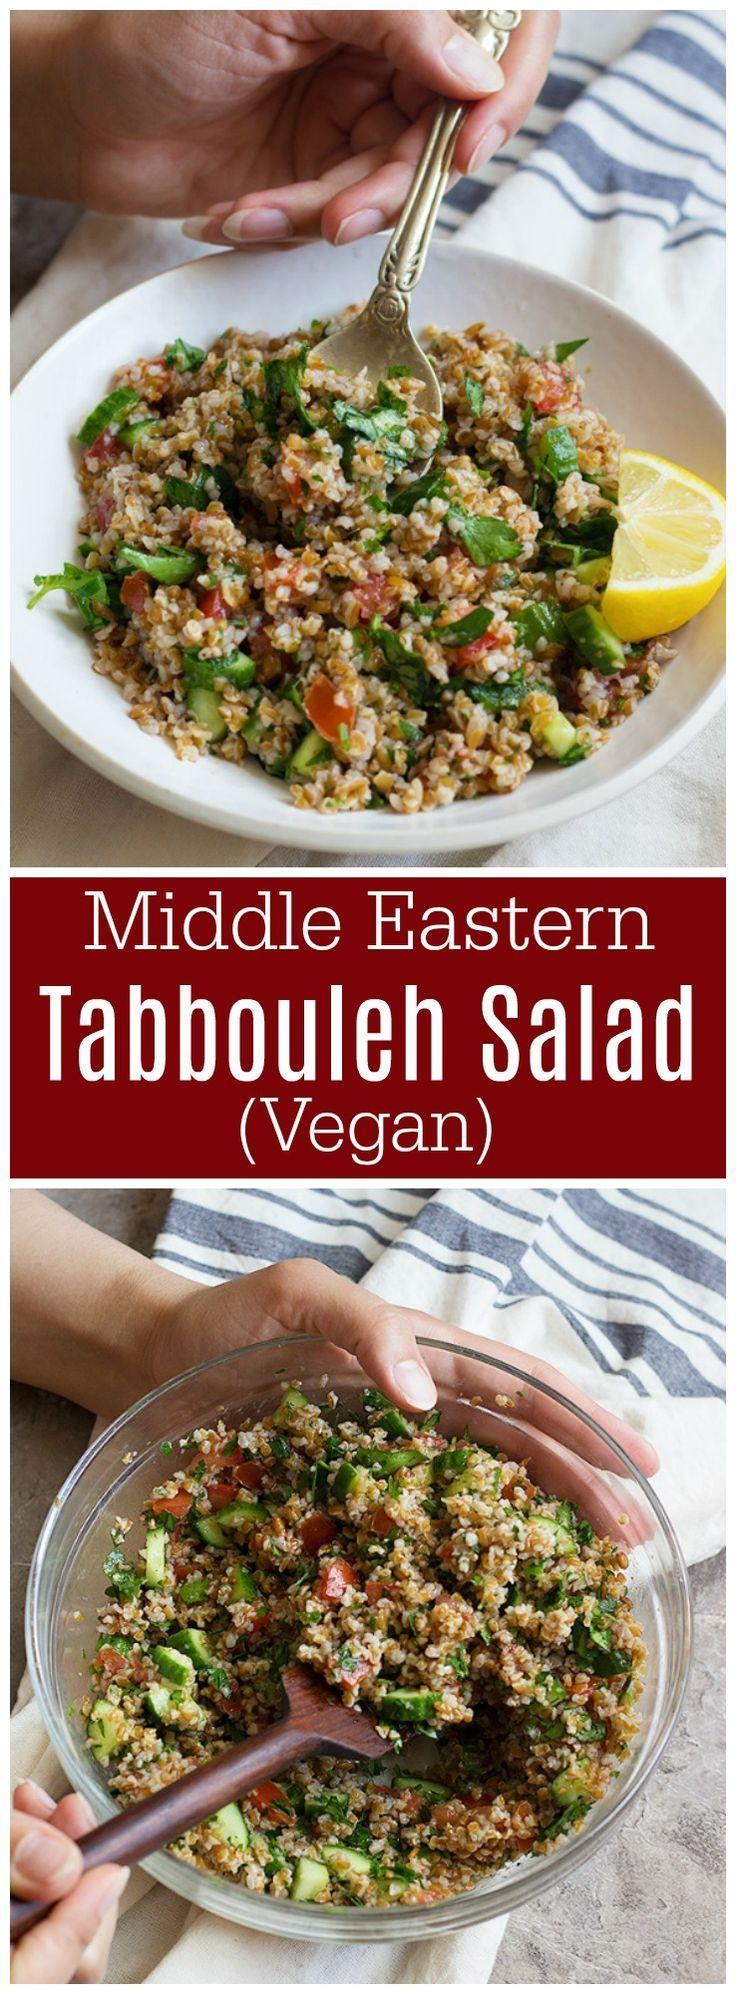 1e498e45a76e90f190cb46e5bab75197 - Tabbouleh Rezepte